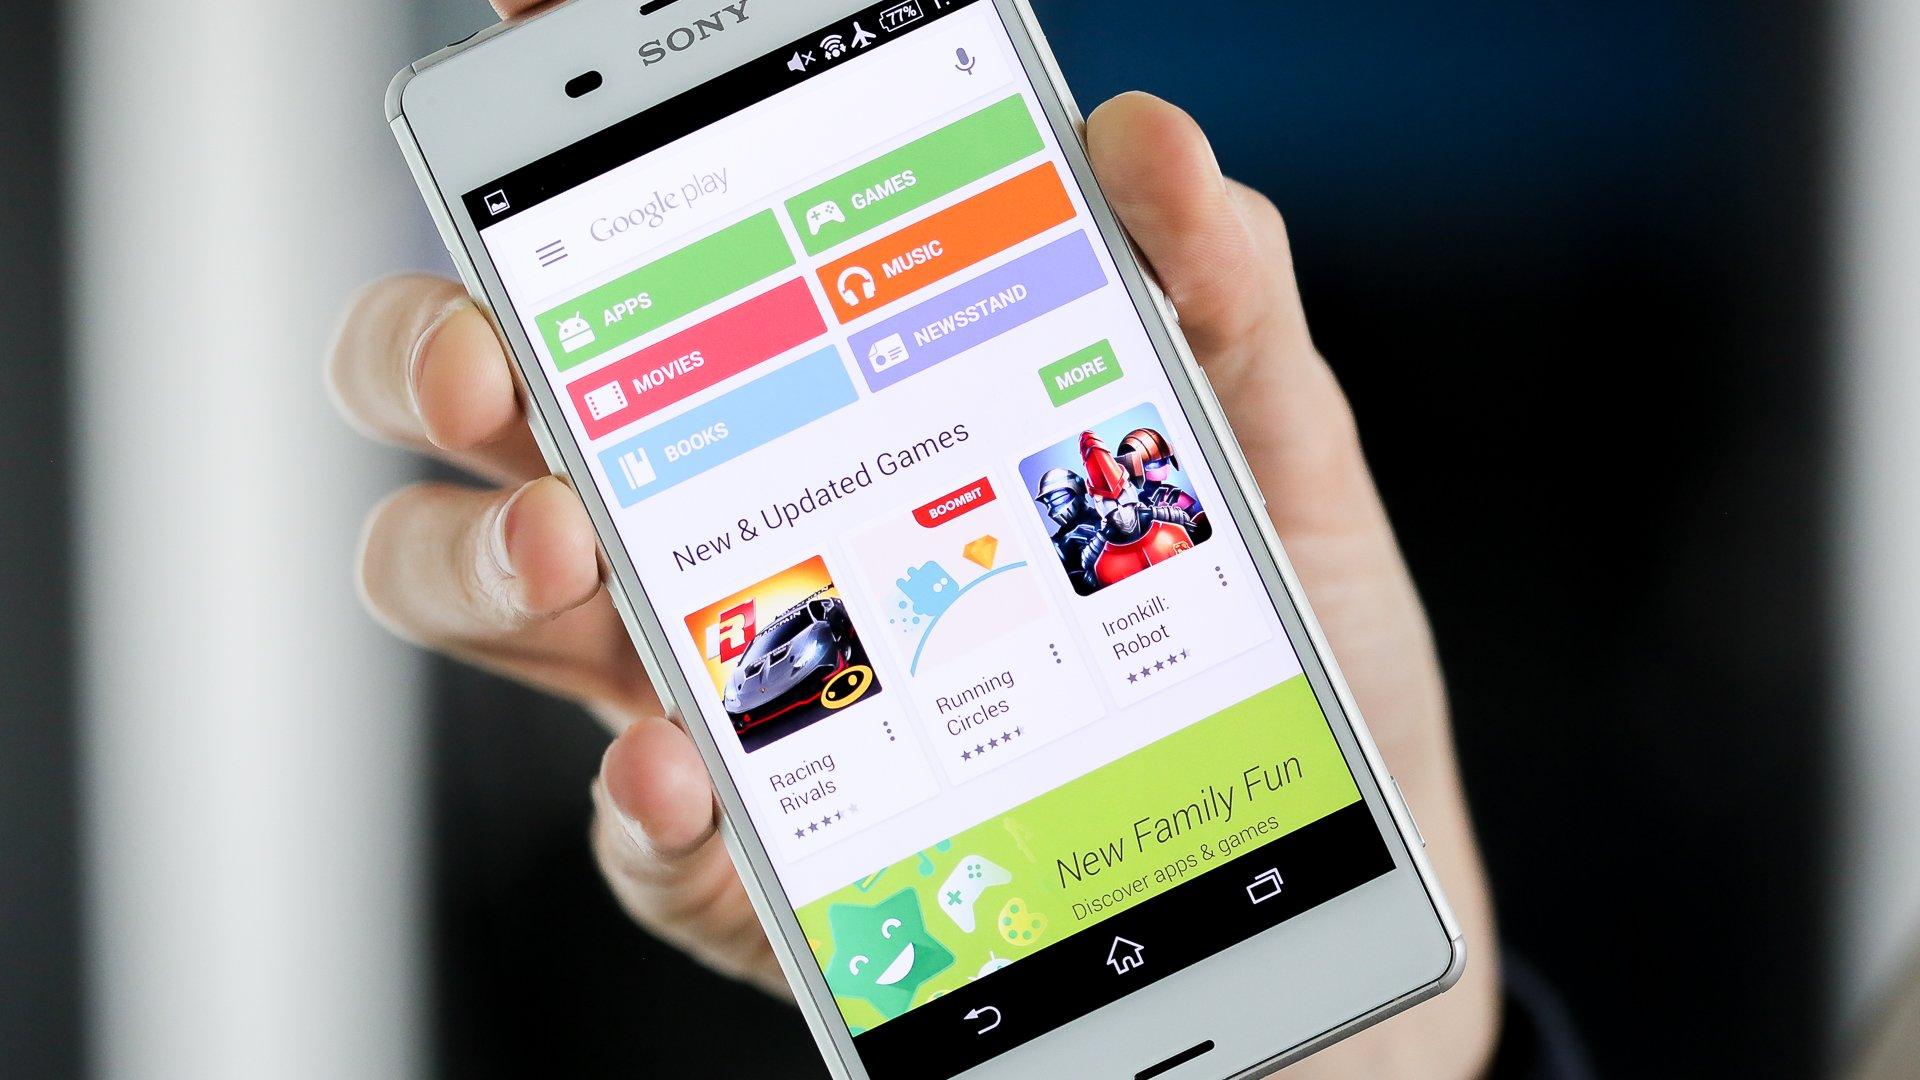 VPN rimosse dall'Apple App Store cinese: Tim Cook spiega